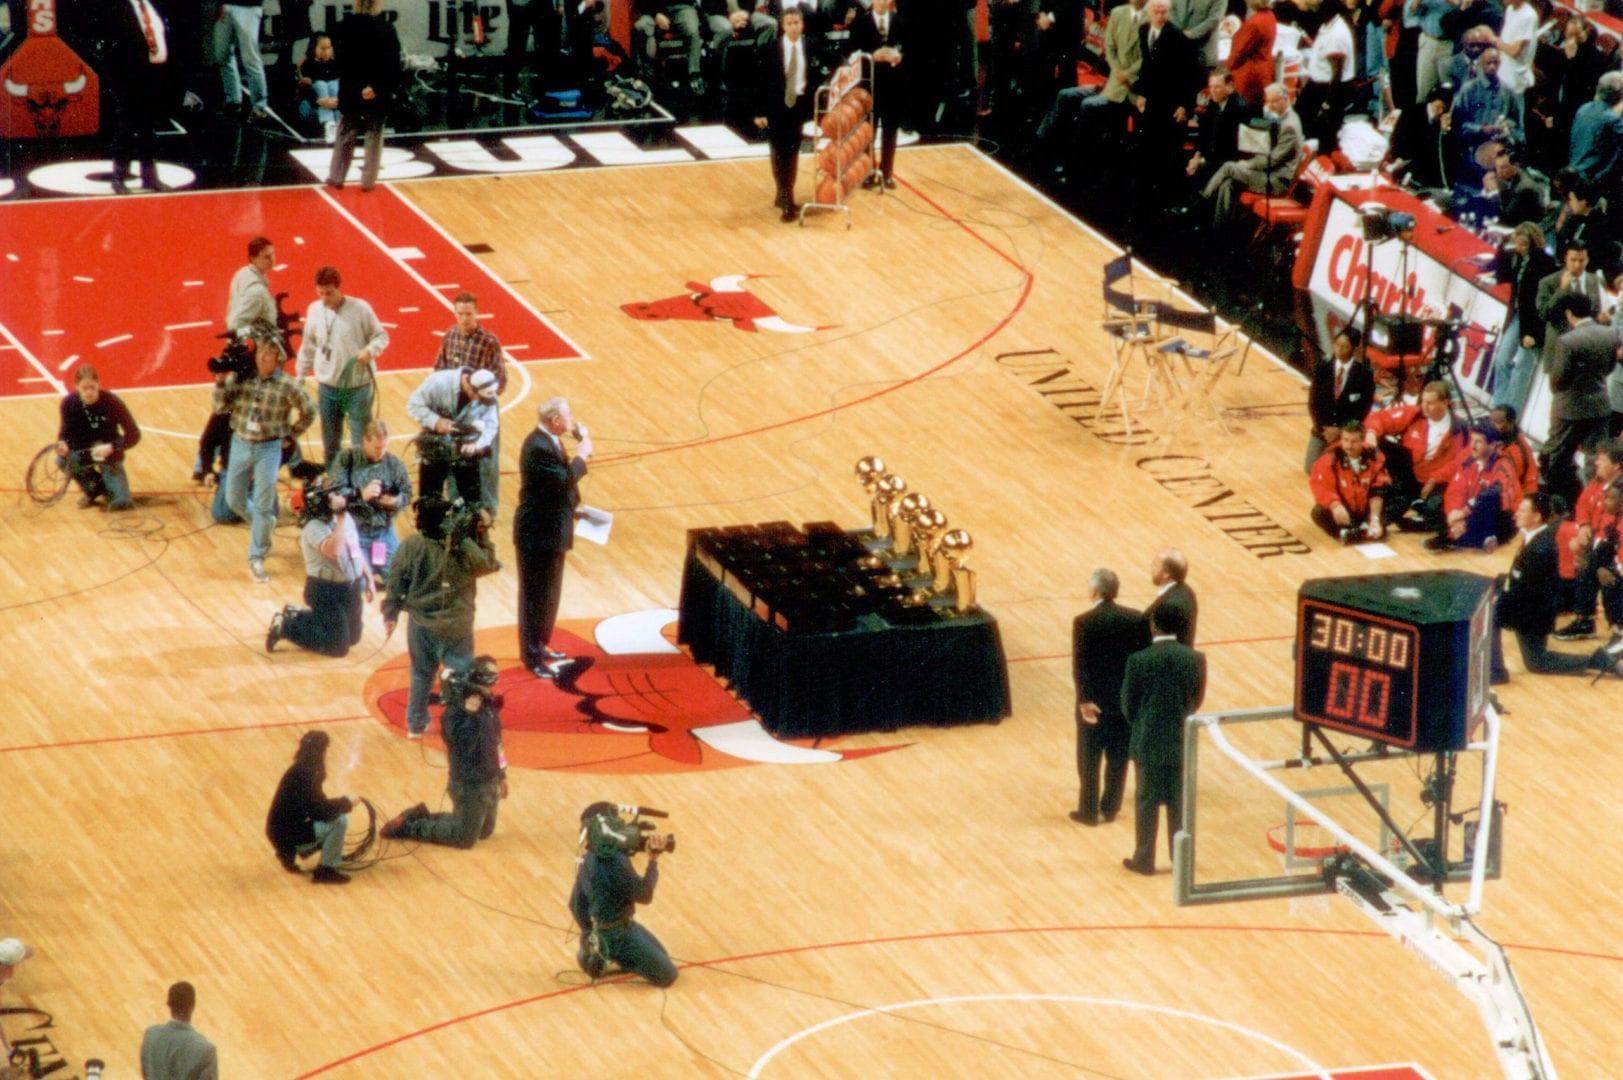 Camera men on the basketball court